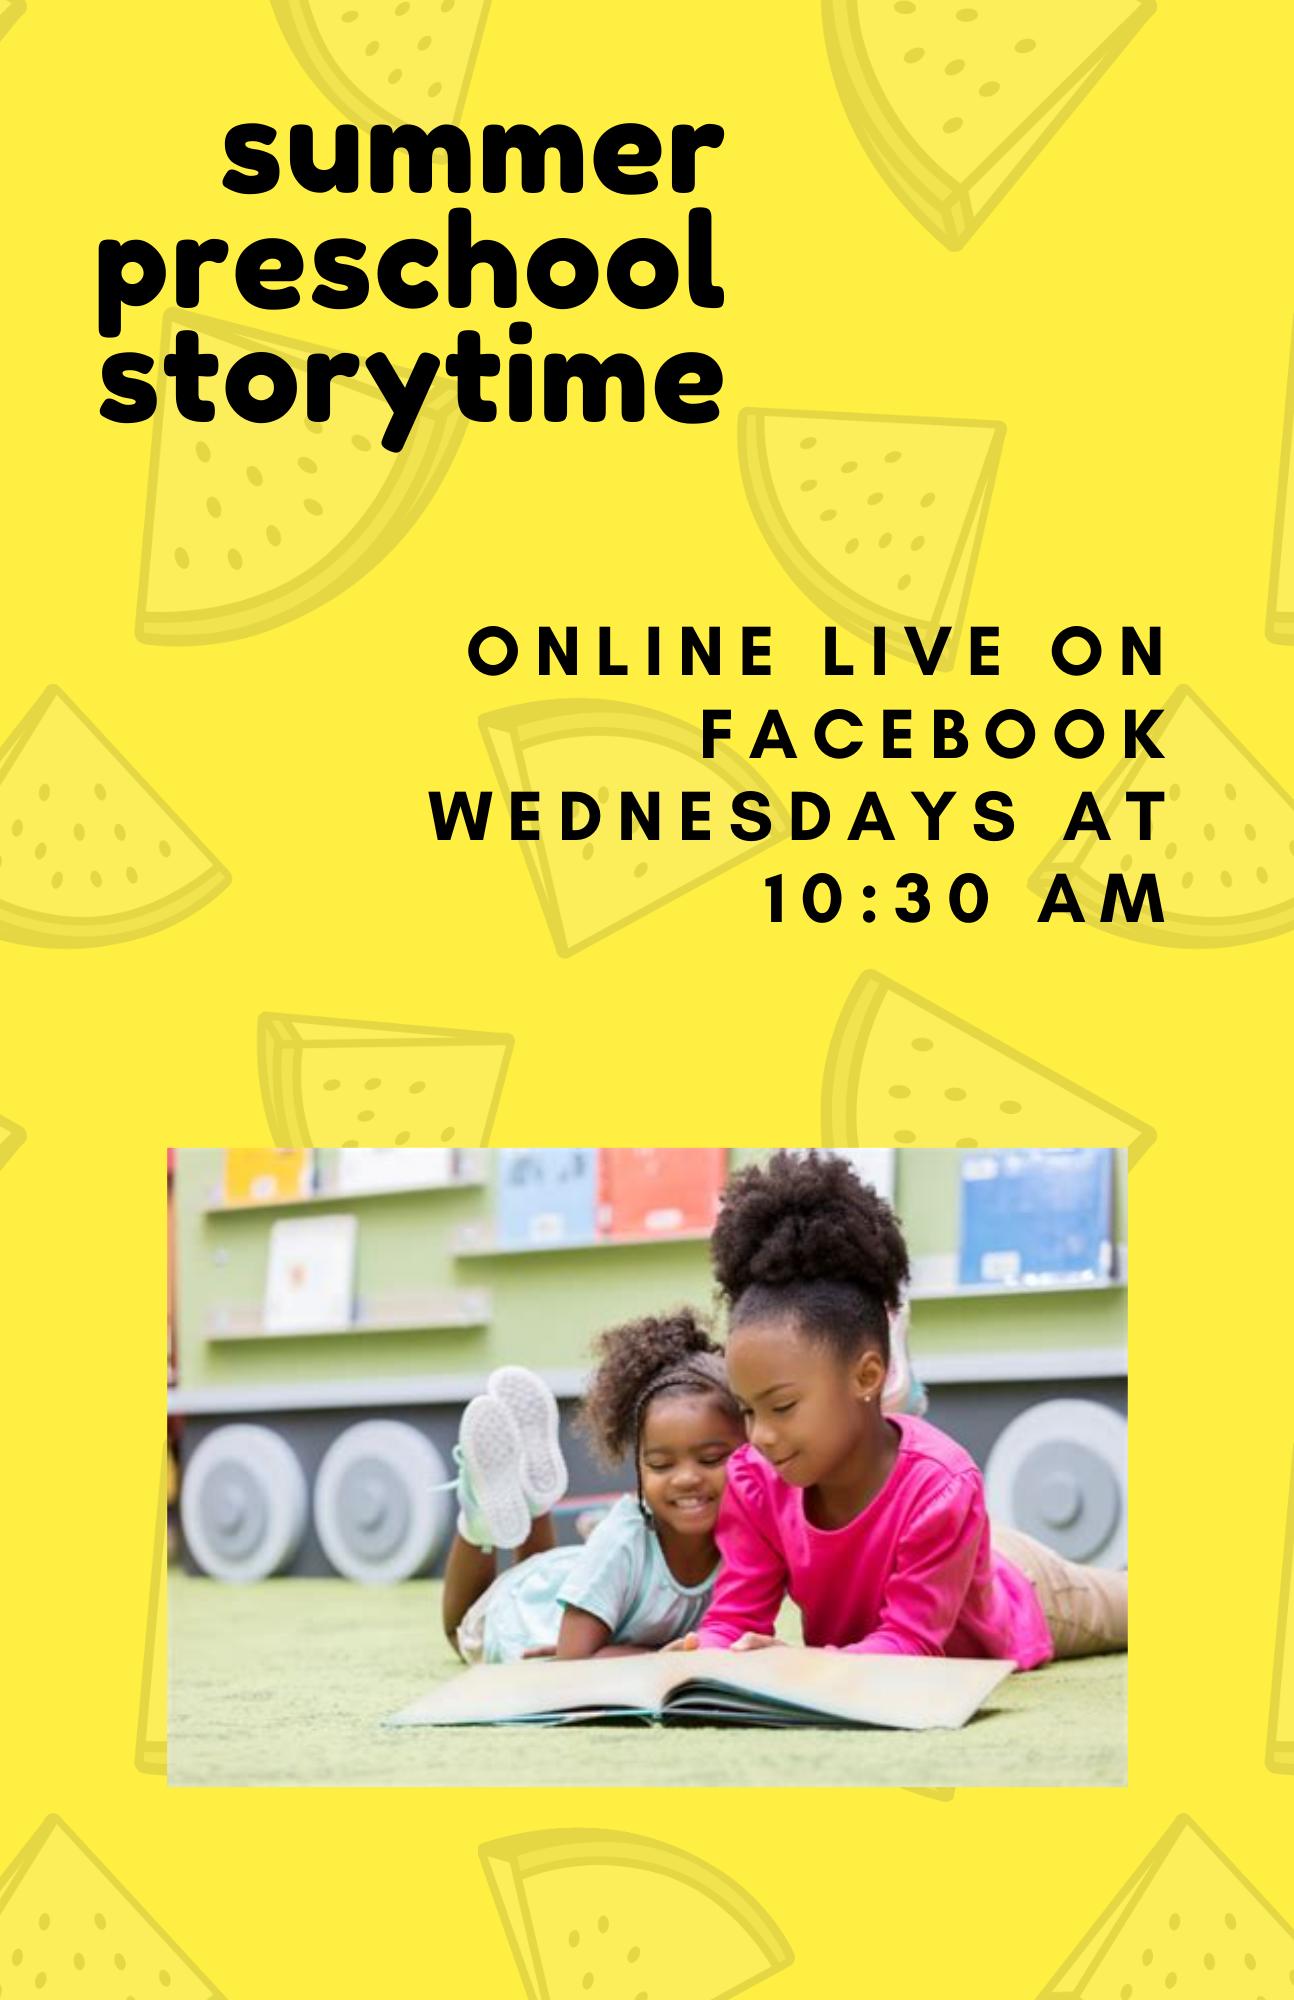 Summer Preschool Virtual Storytime